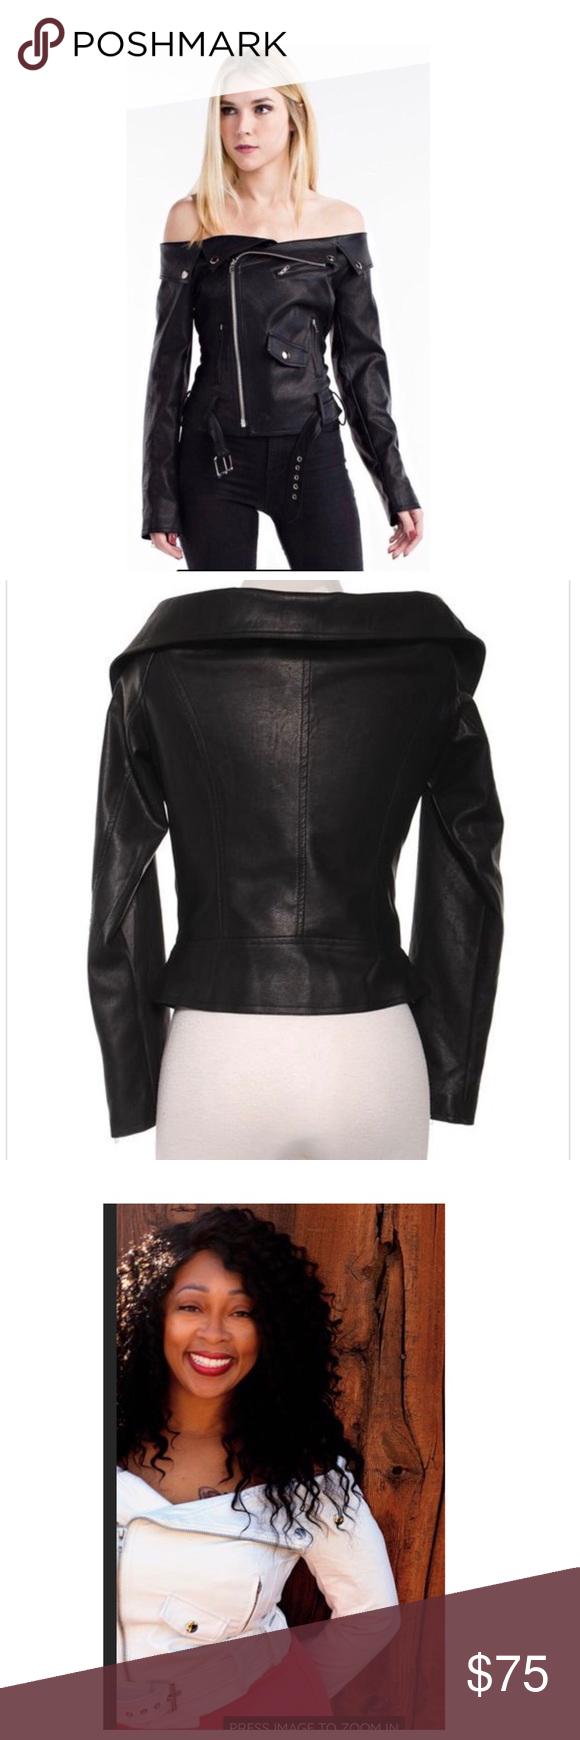 White Leather Jacket (faux) White Faux leather jacket off